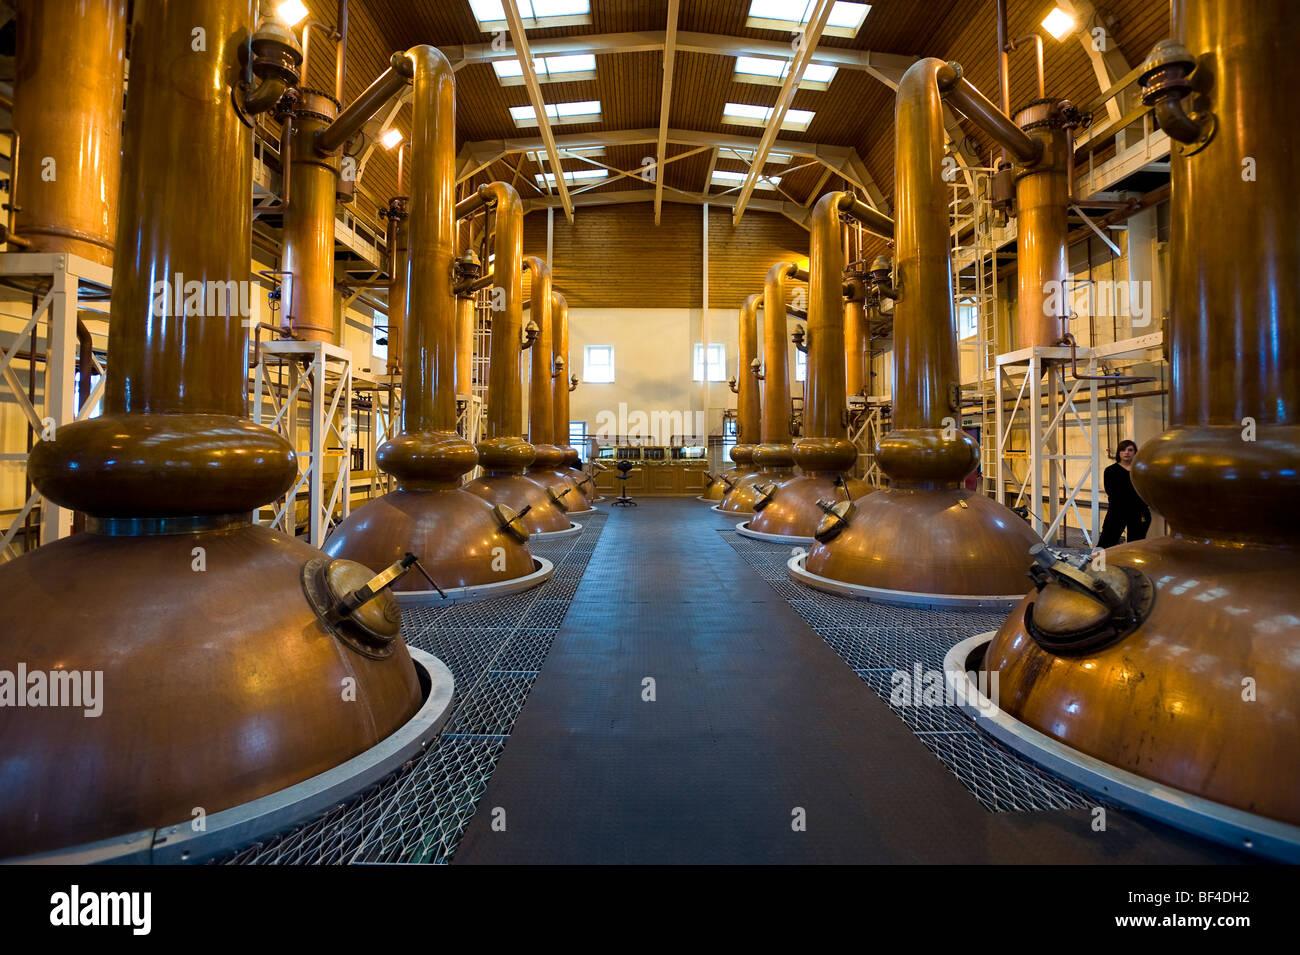 Glenmorangie, stills, Whiskey Distillery, Tain, Scotland, United Kingdom, Europe - Stock Image